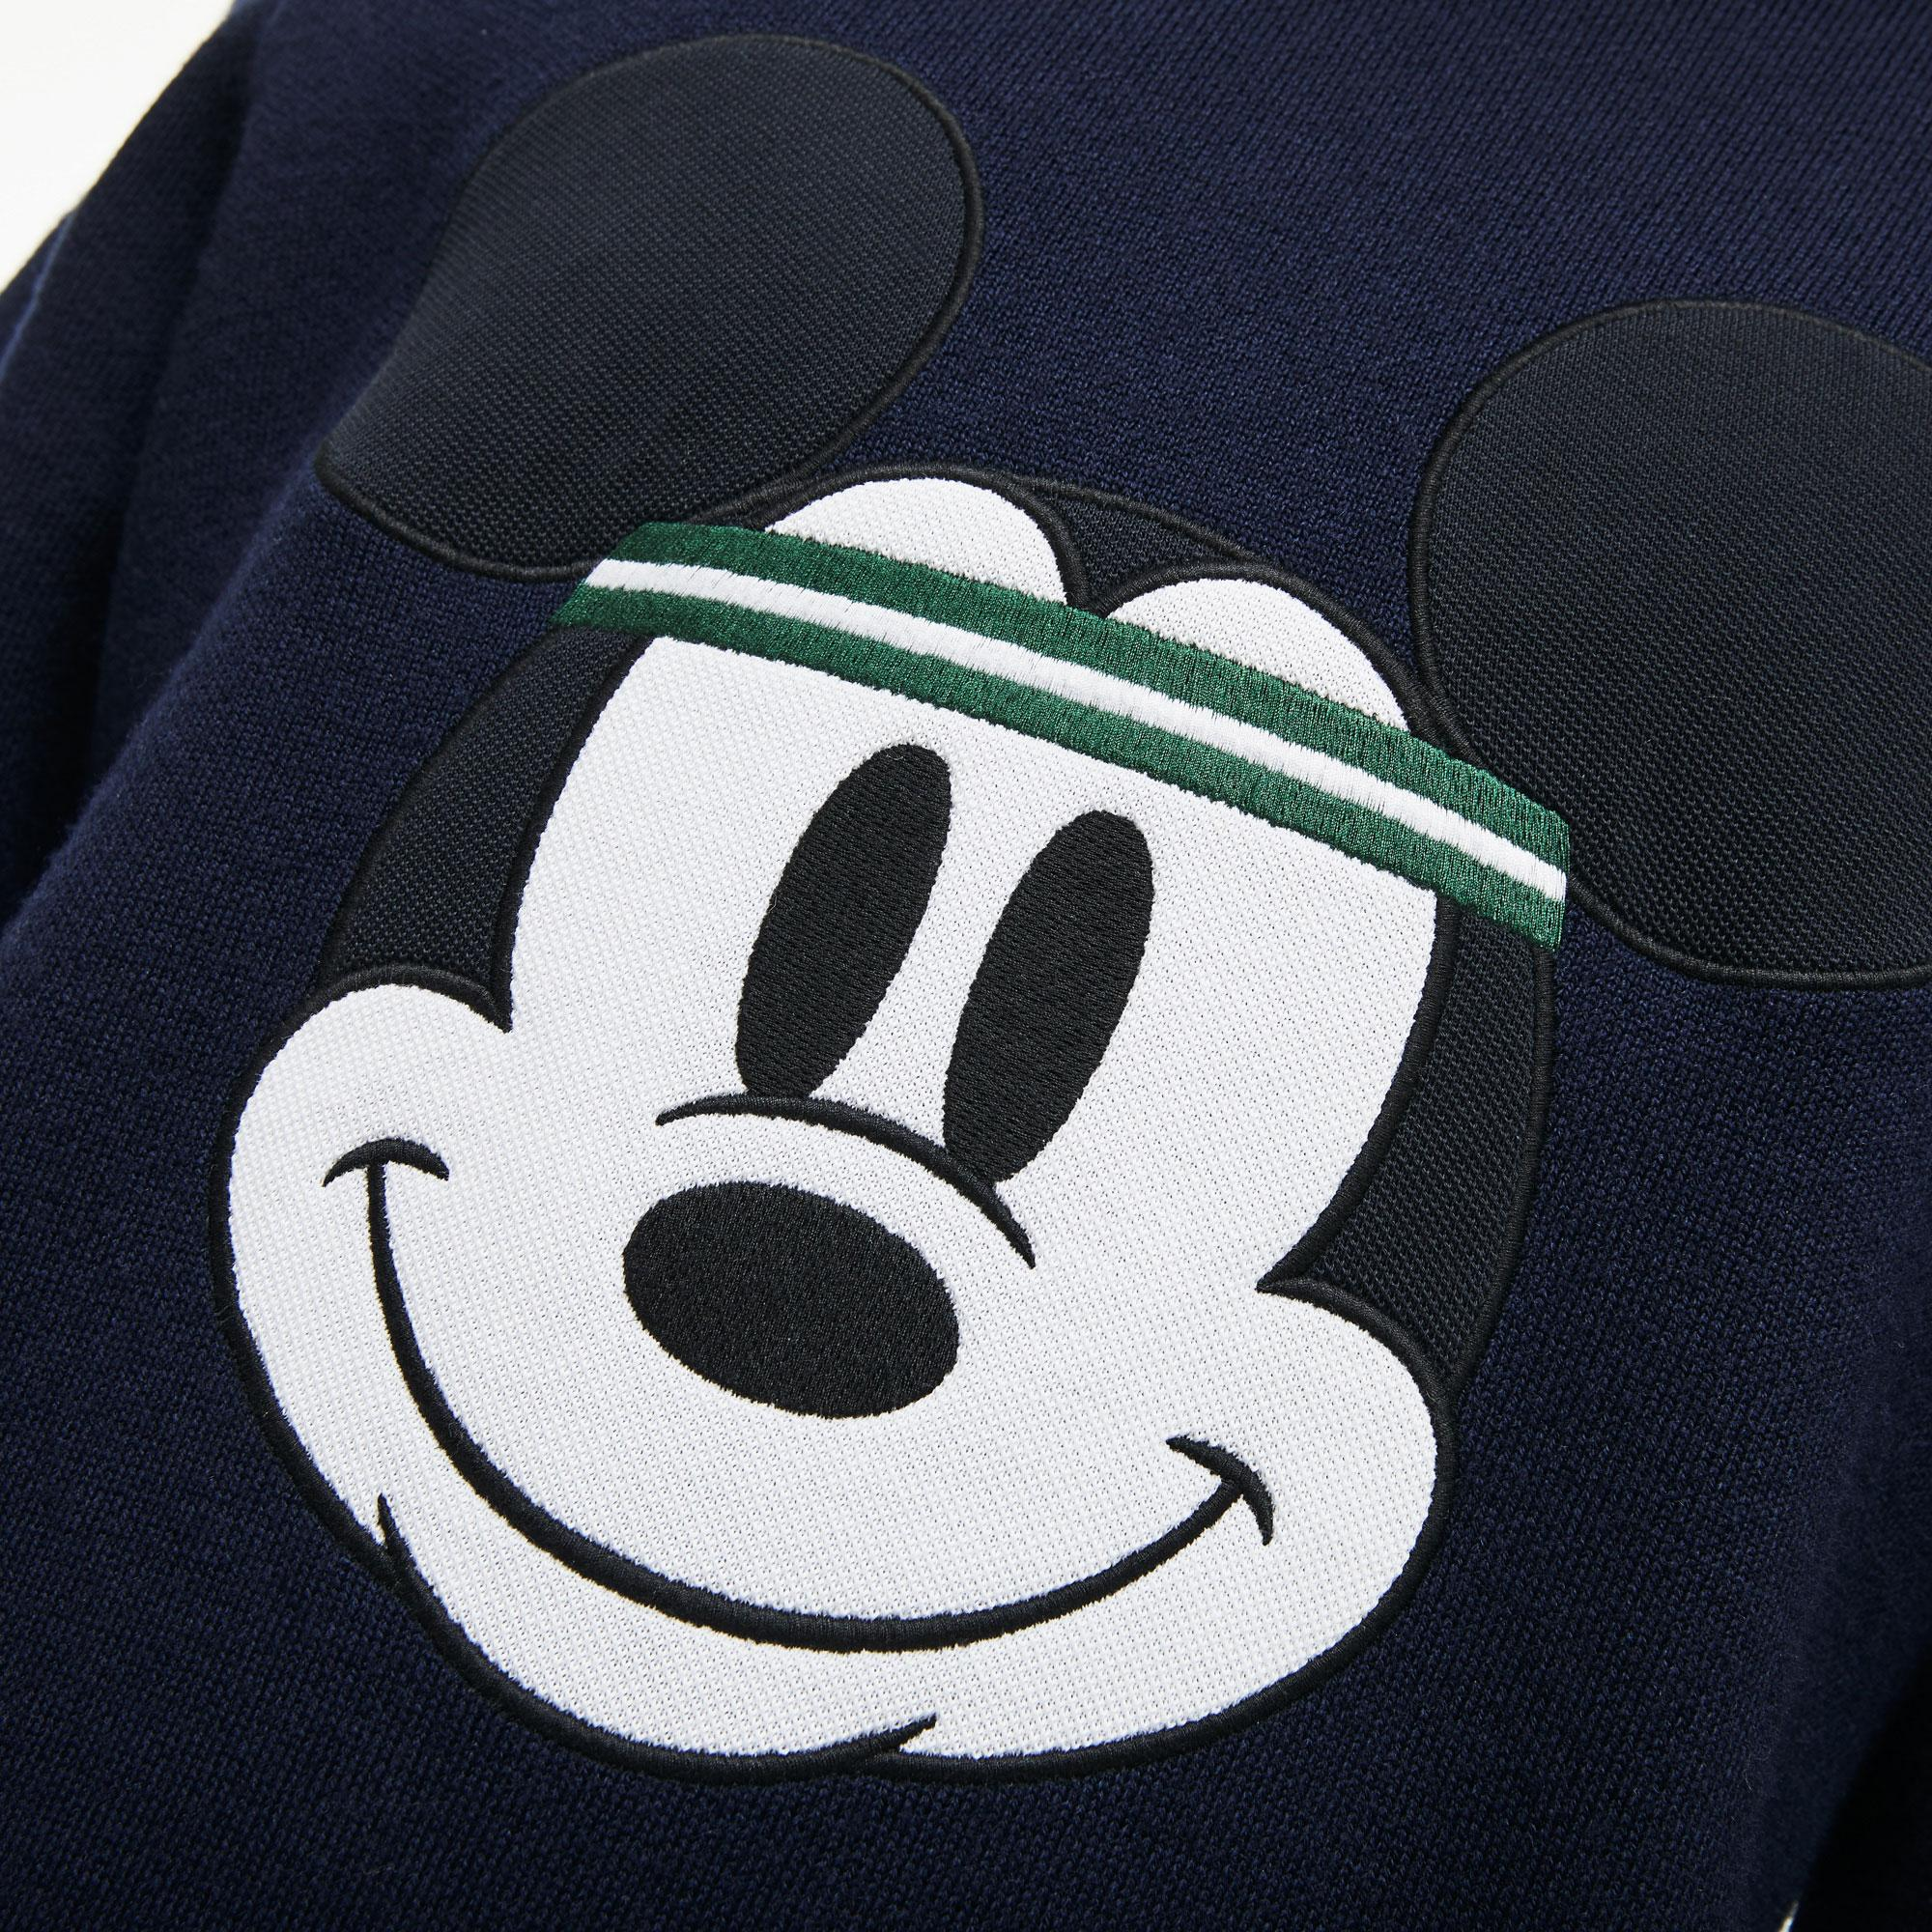 Lacoste X Disney Erkek Mickey İşlemeli Lacivert Bisiklet Yaka Triko Kazak